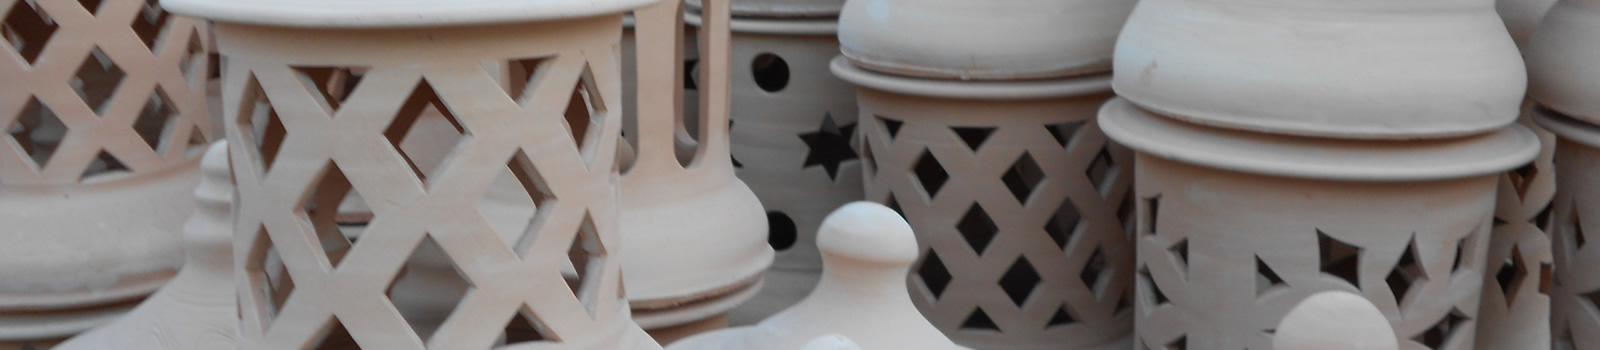 ceramicas marratxi, cerámicas en mallorca